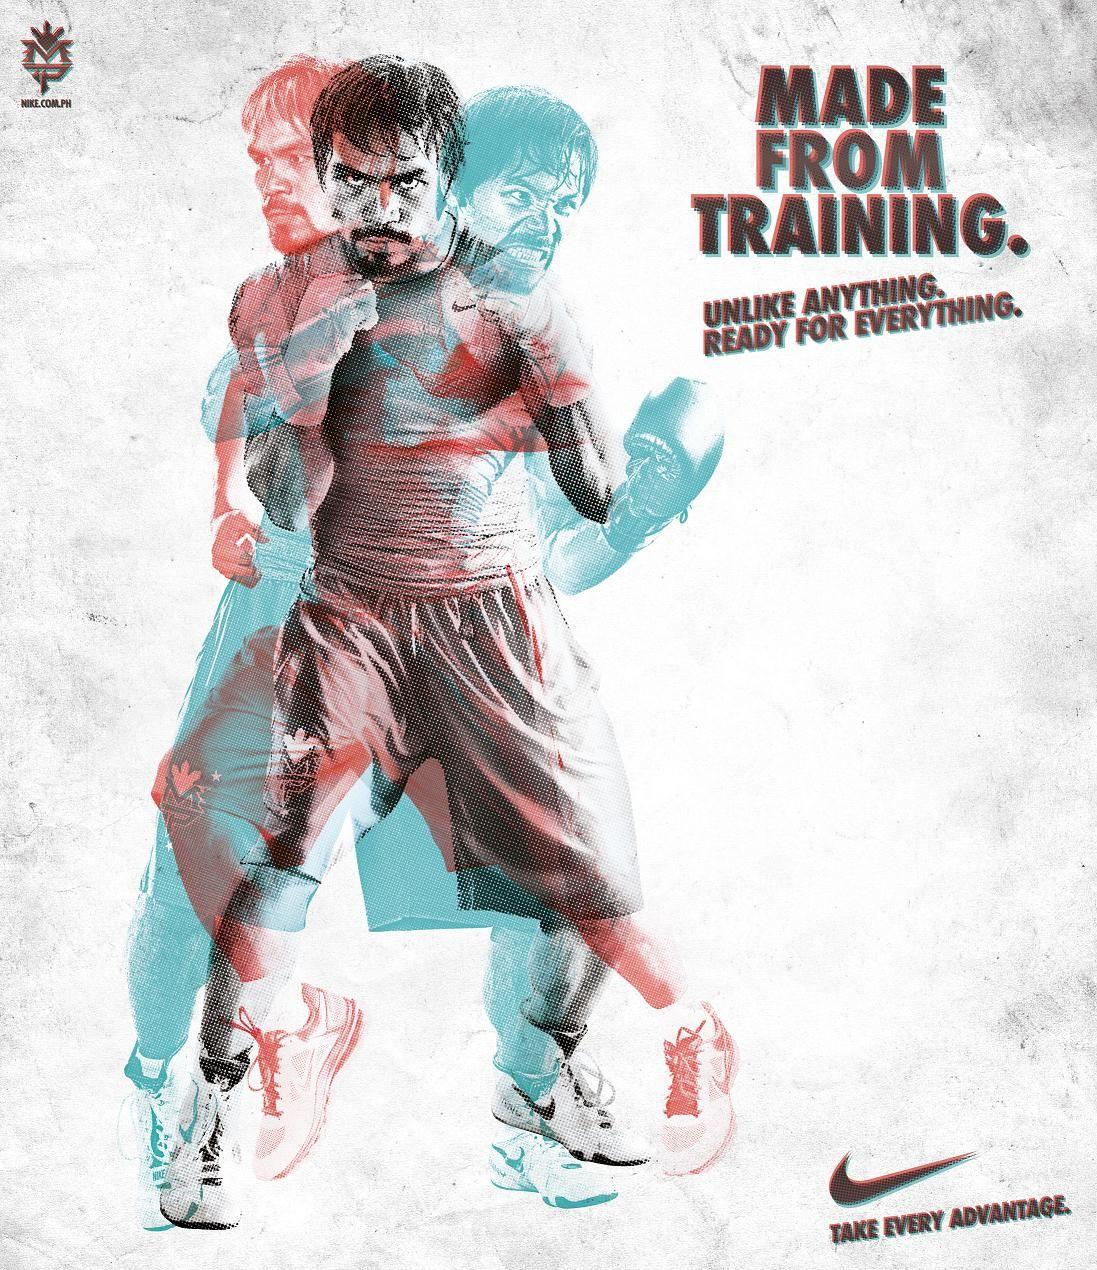 Poster design key - Nike Poster